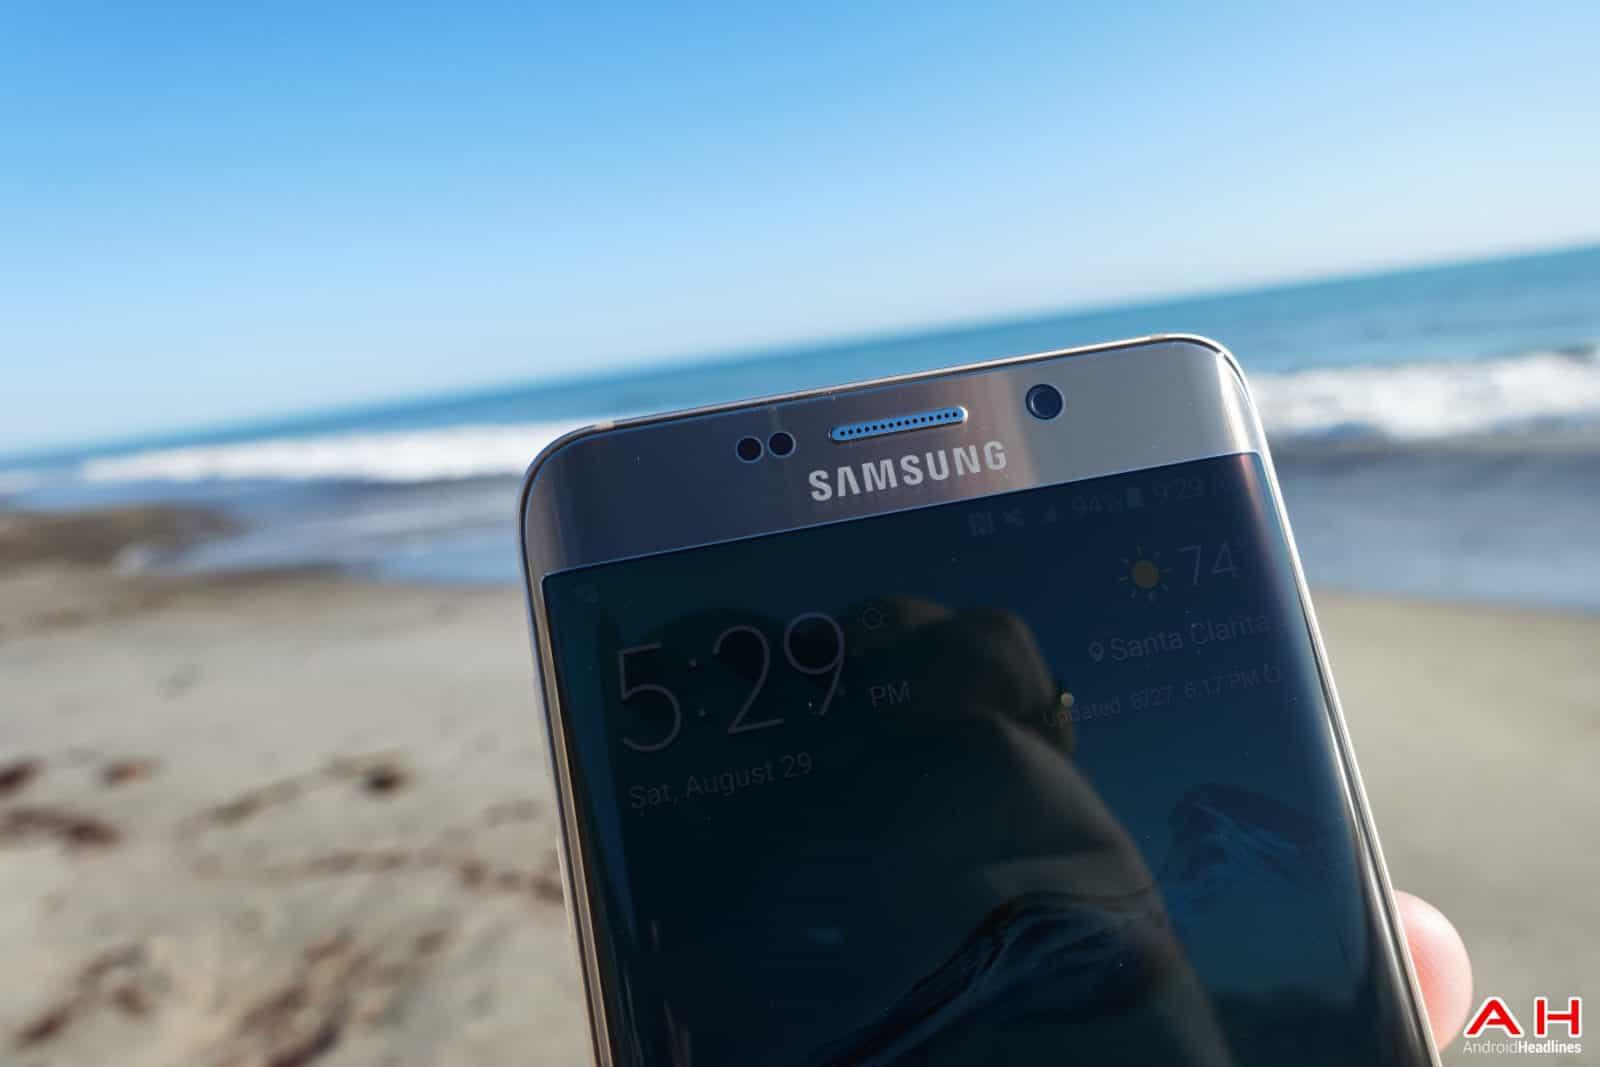 AH Samsung Galaxy S6 Plus + 2015 Chris-13